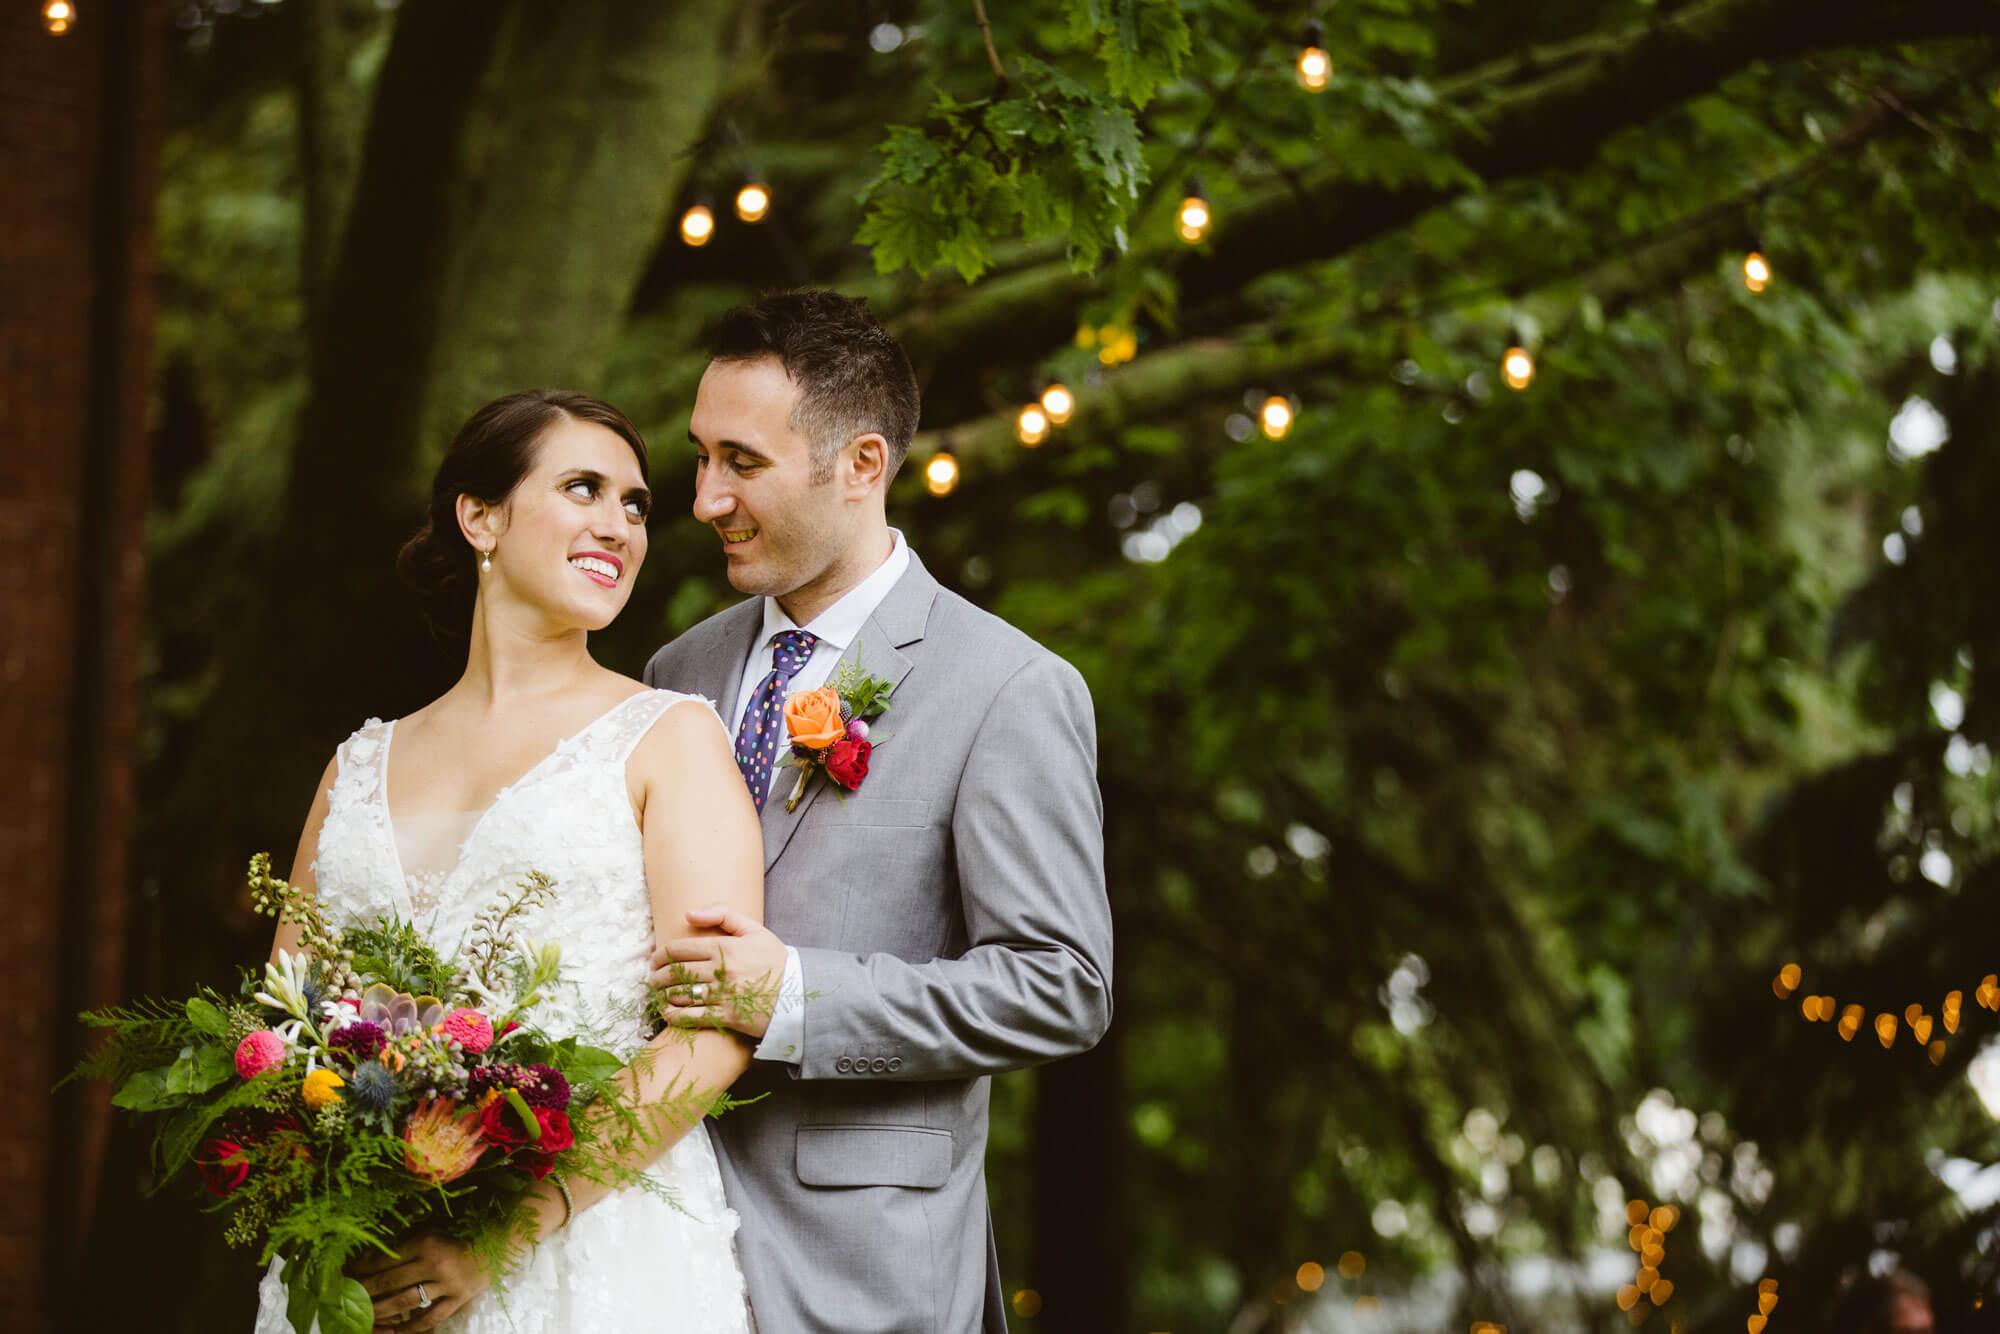 Erica-Kay-Photography---Kate-_-Joe-Wedding-25.jpg